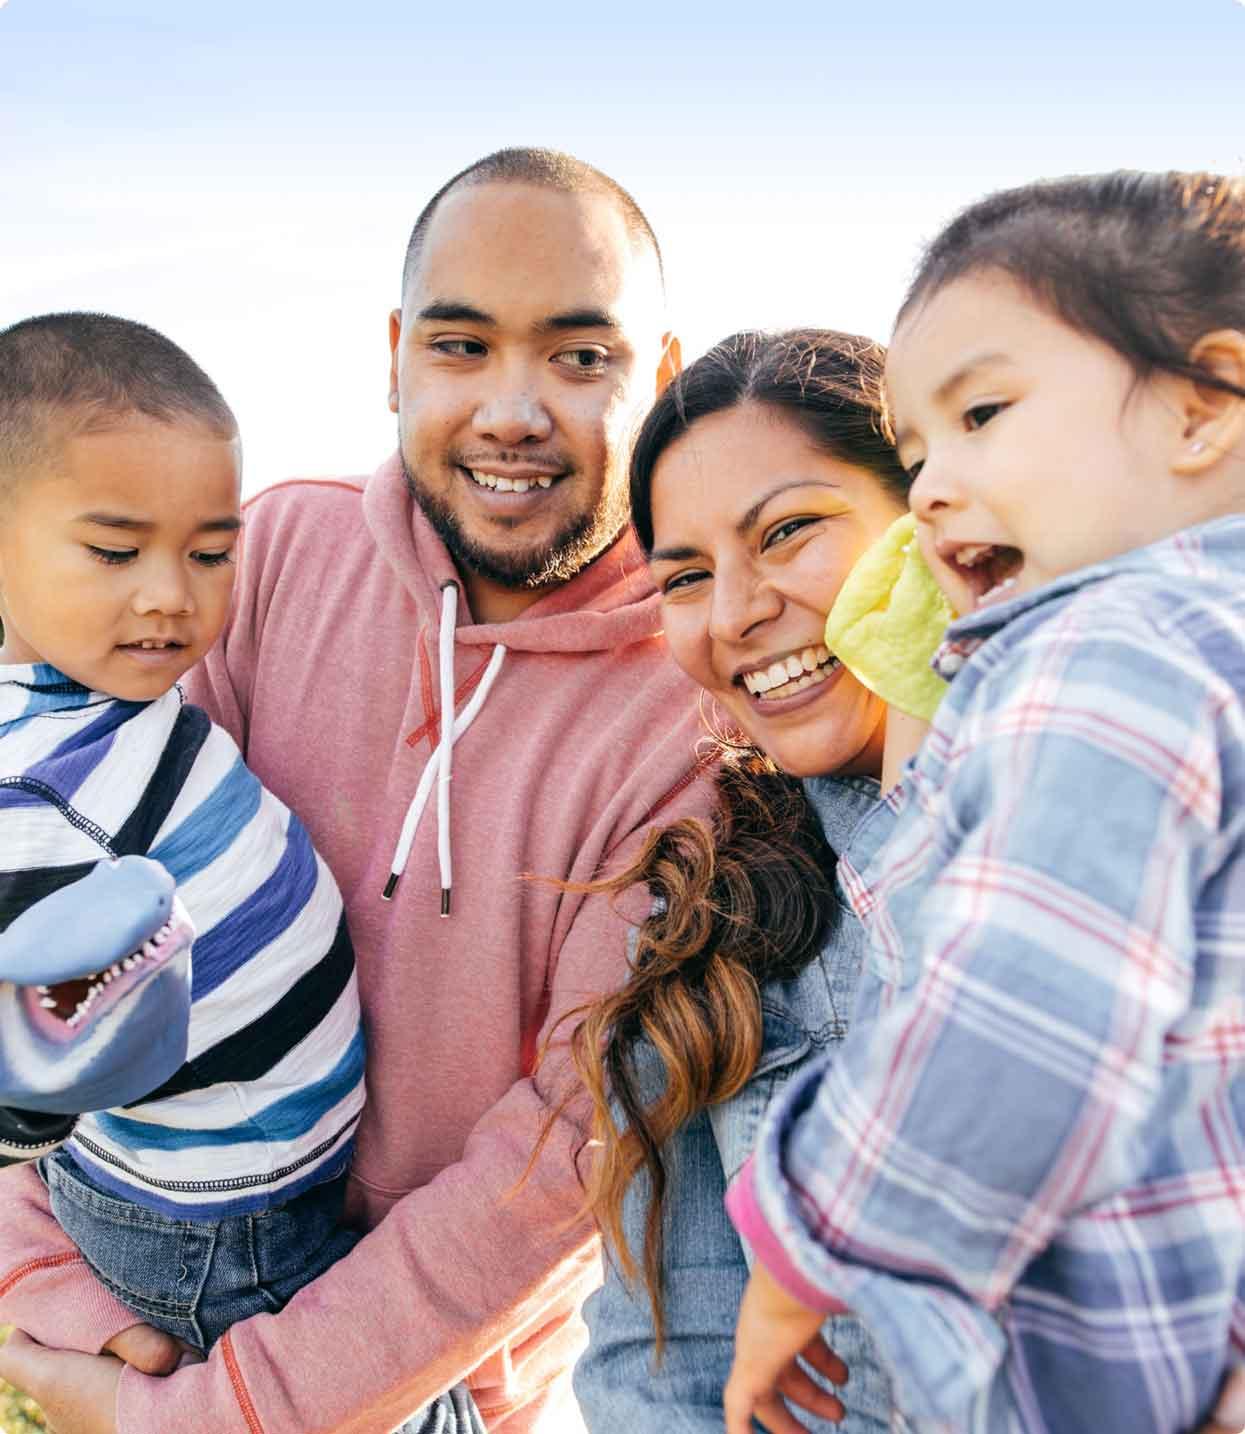 Hispanic family with 2 children